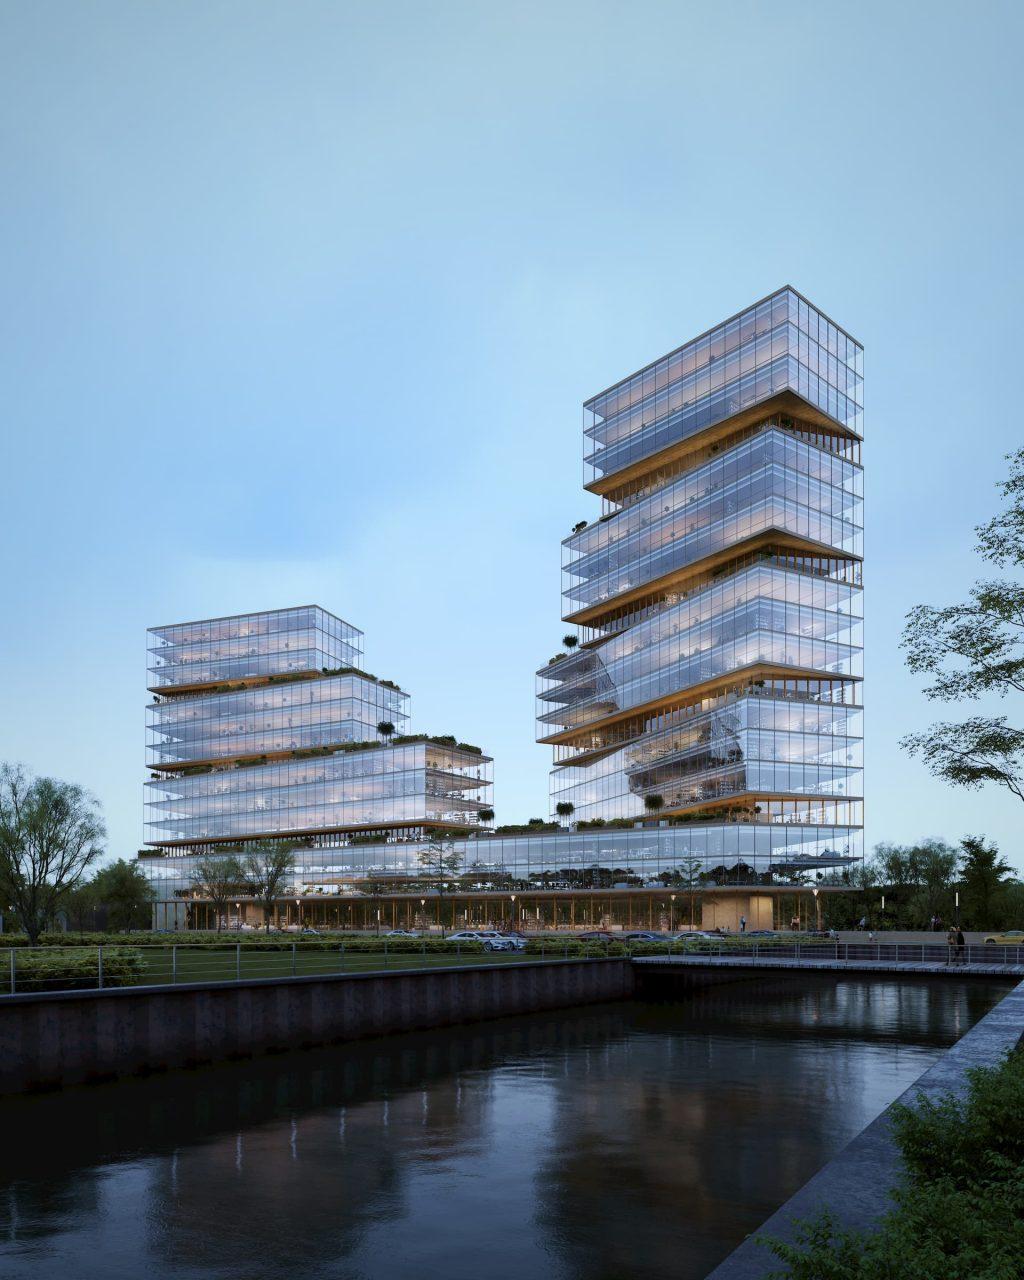 Office development building Amsterdam daylight glass transparent windows